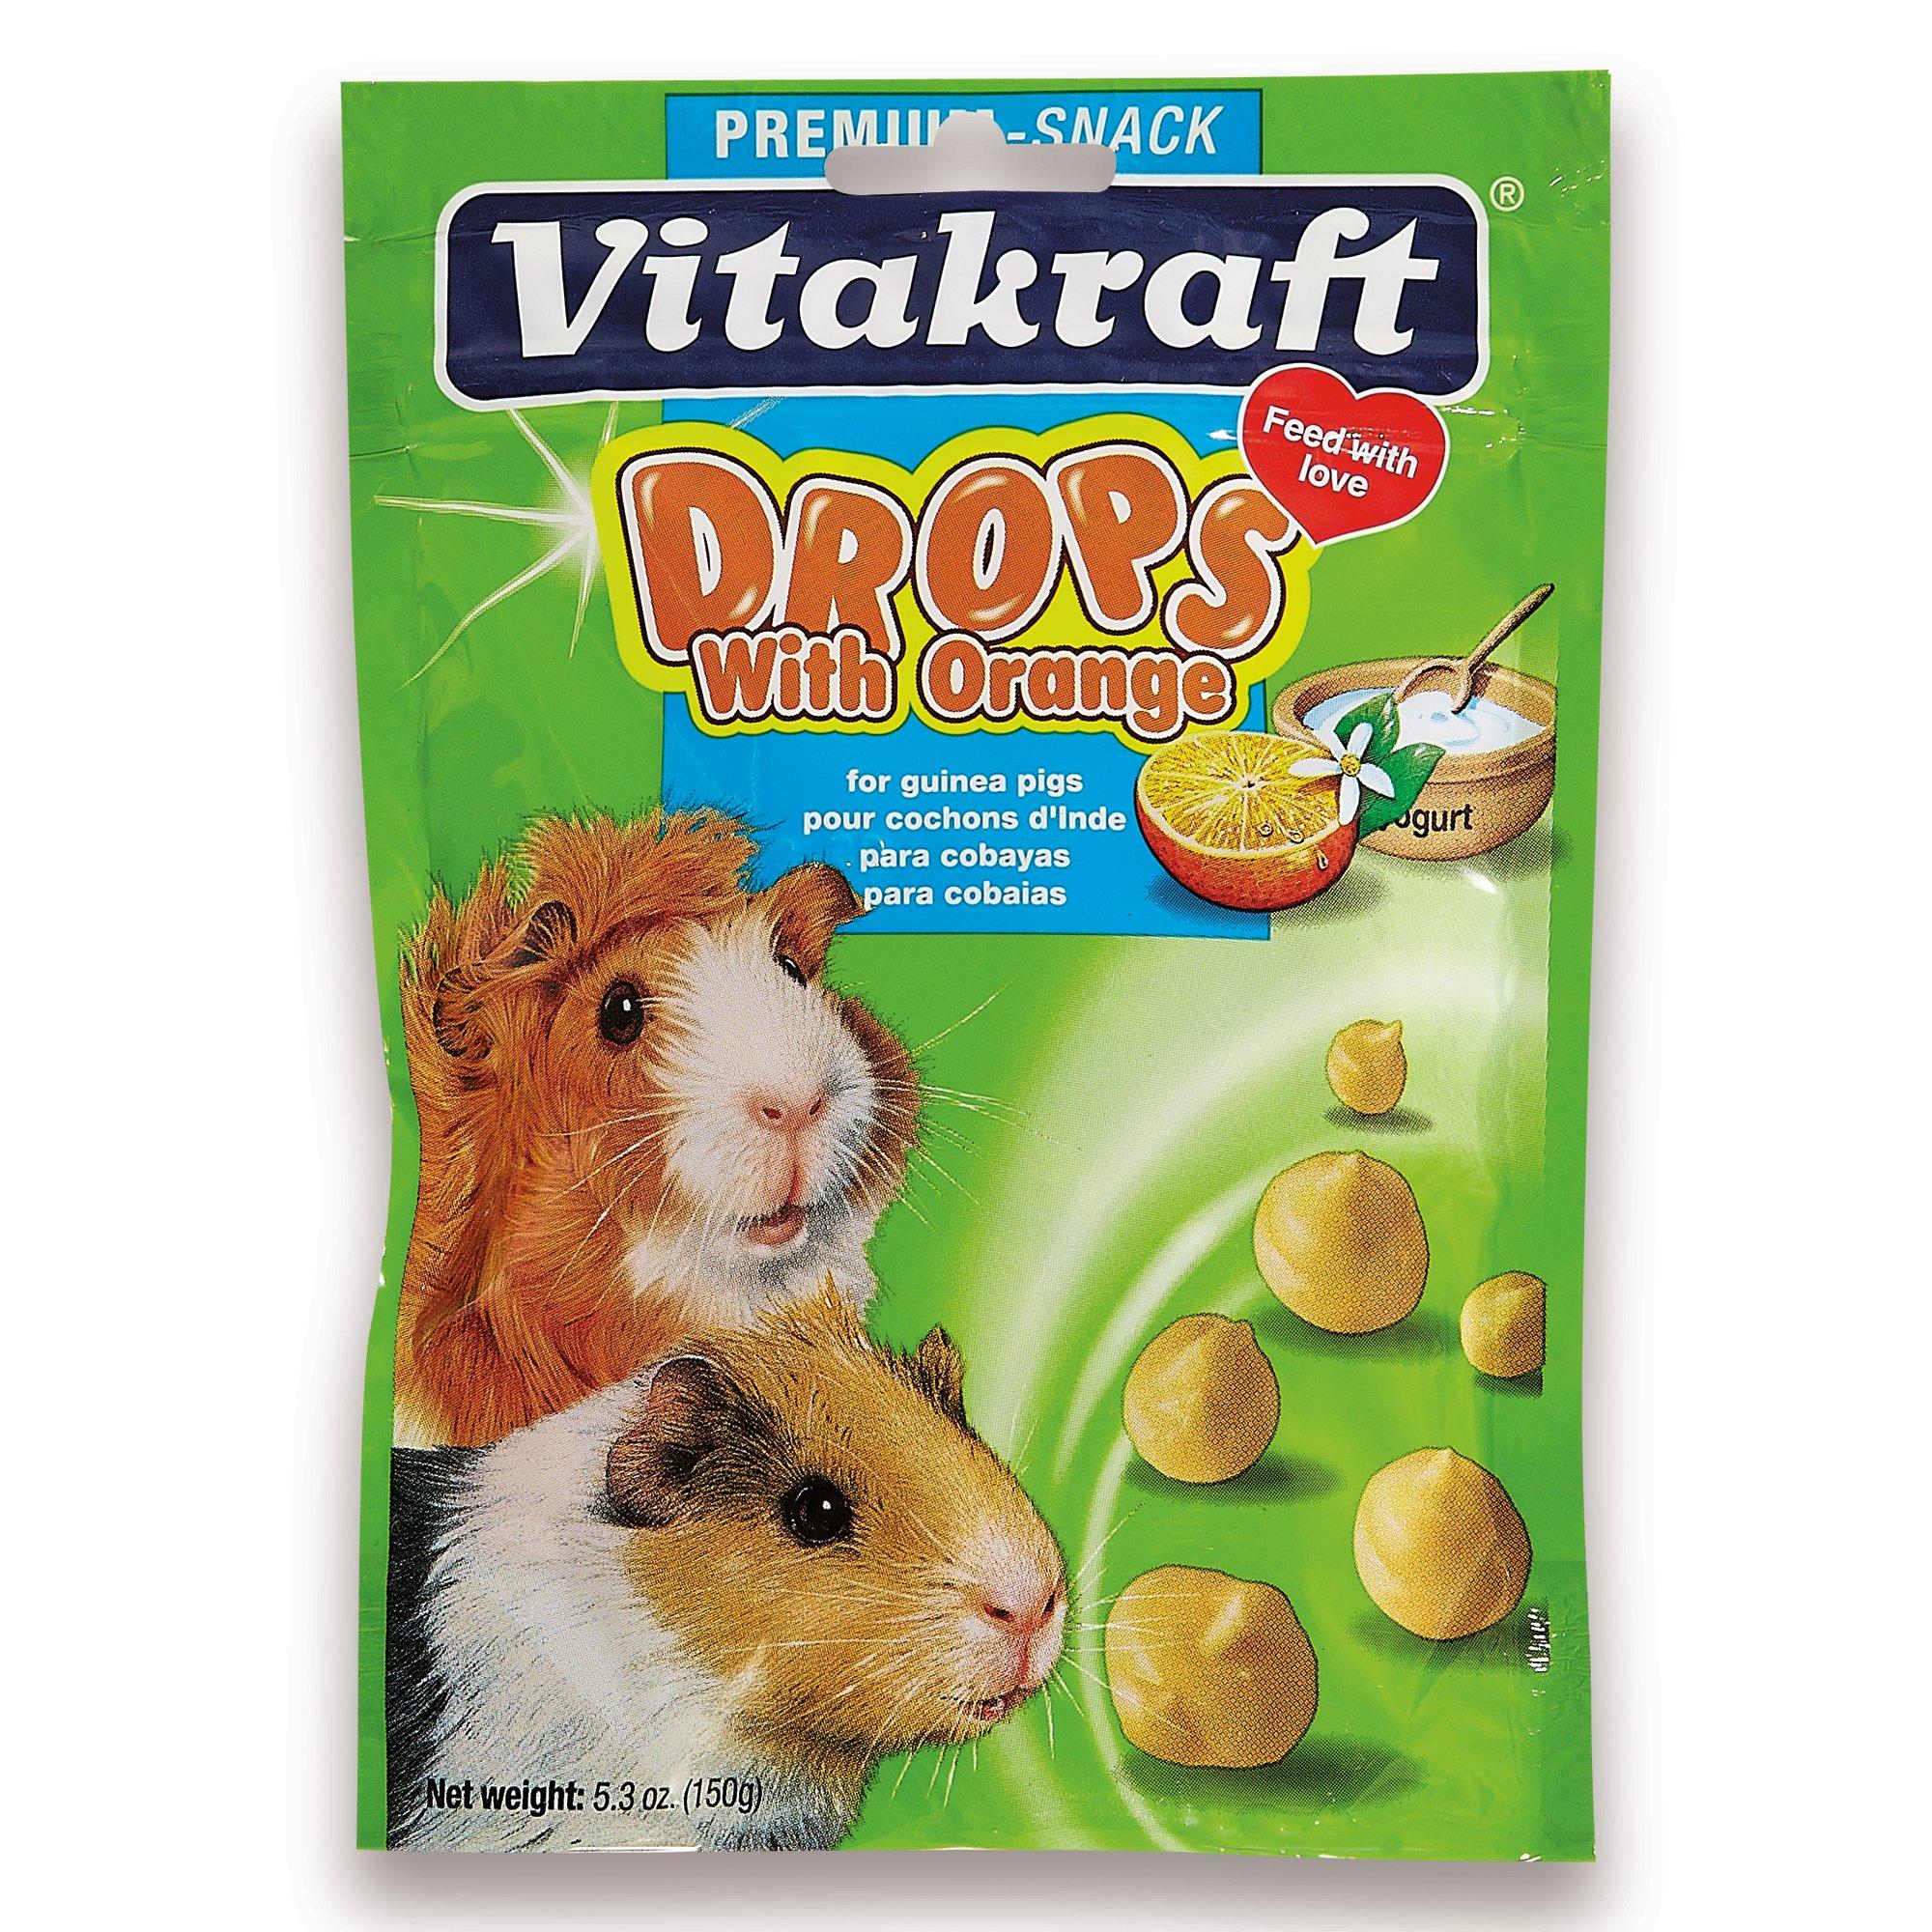 Vitakraft Orange Drops for Guinea Pigs